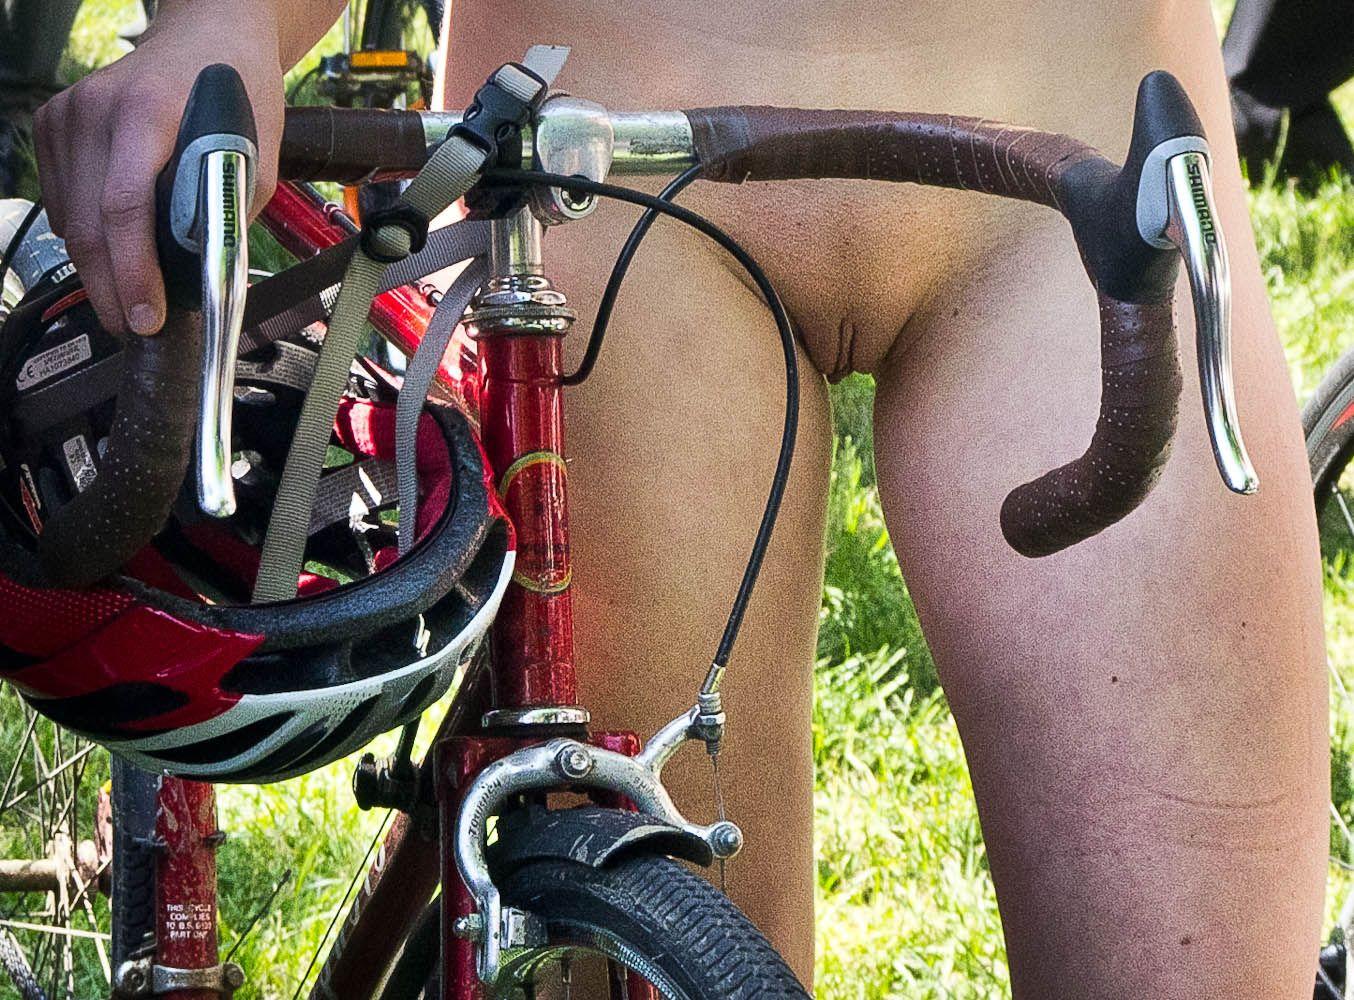 nude-horney-bike-removal-clip-art